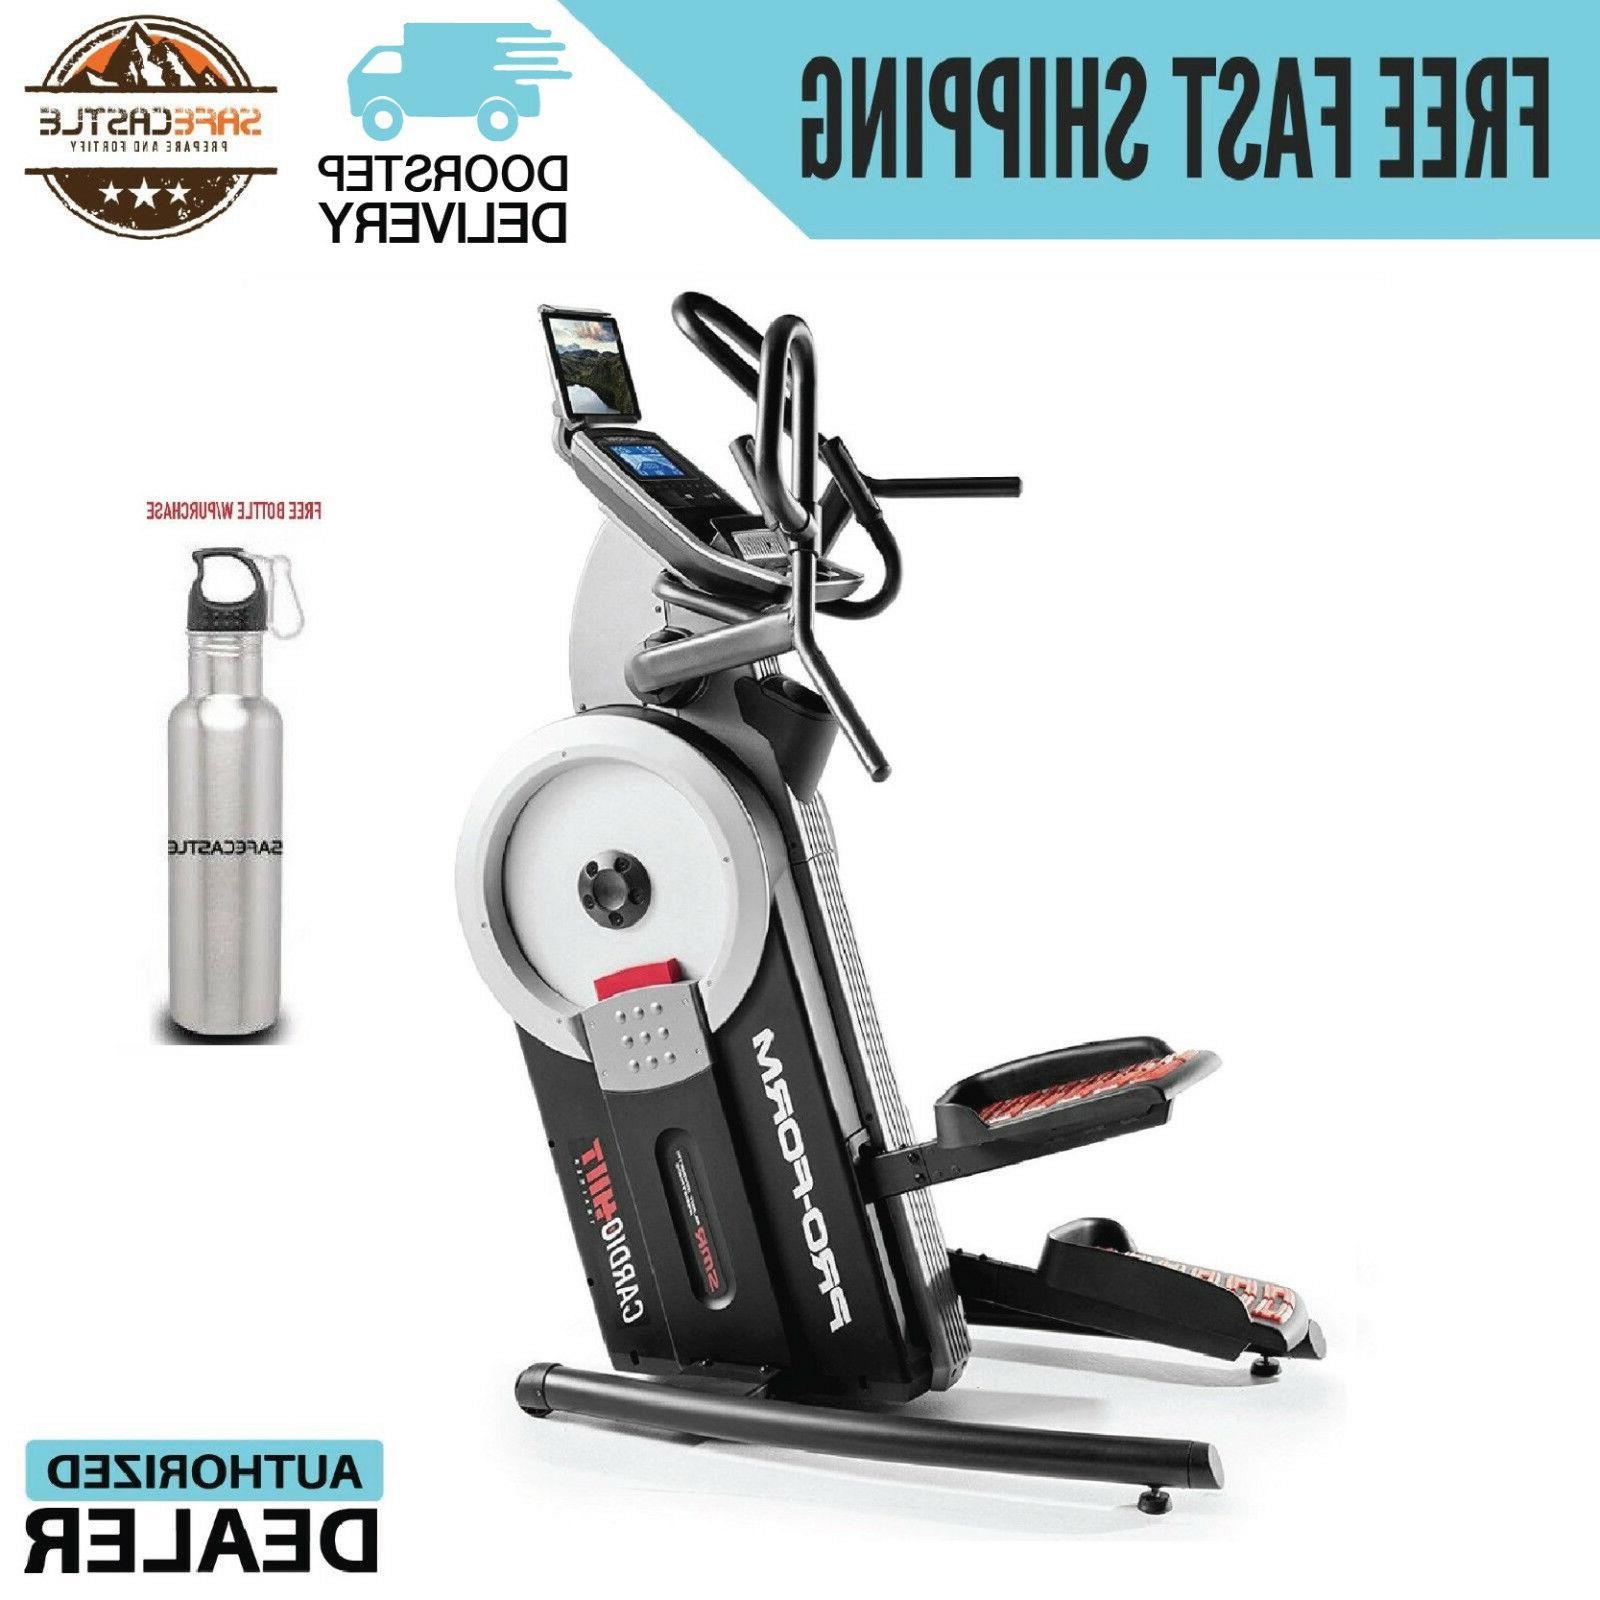 cardio hiit elliptical workout machine pfel09915 threshold